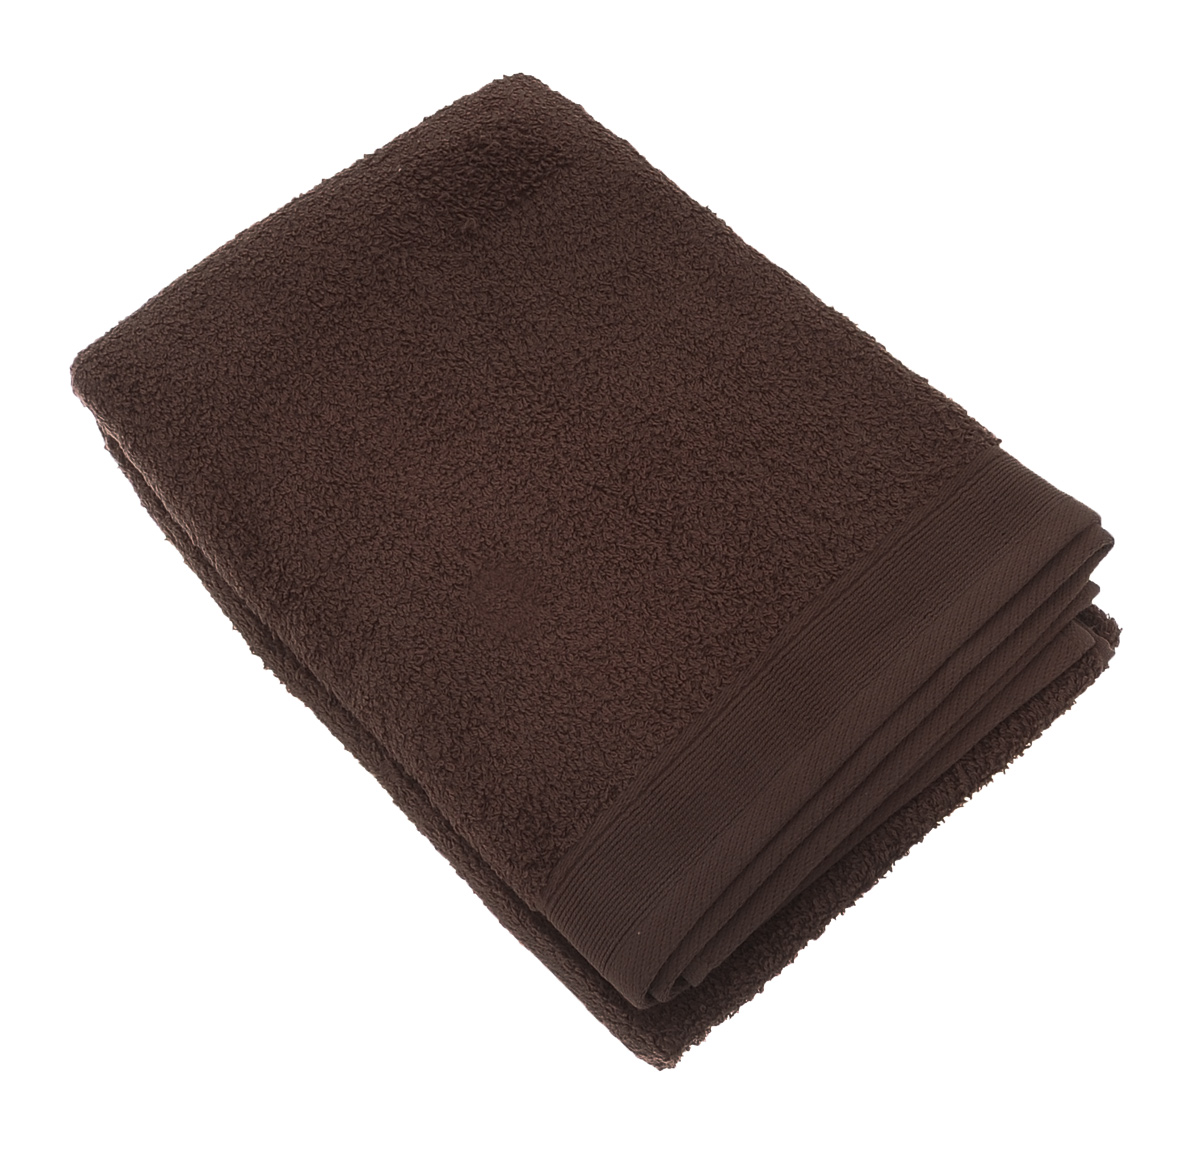 Полотенце махровое Guten Morgen, цвет: какао, 70 см х 140 см полотенце махровое guten morgen гладкокрашенное пммок 70 140 мокко 70 х 140 см